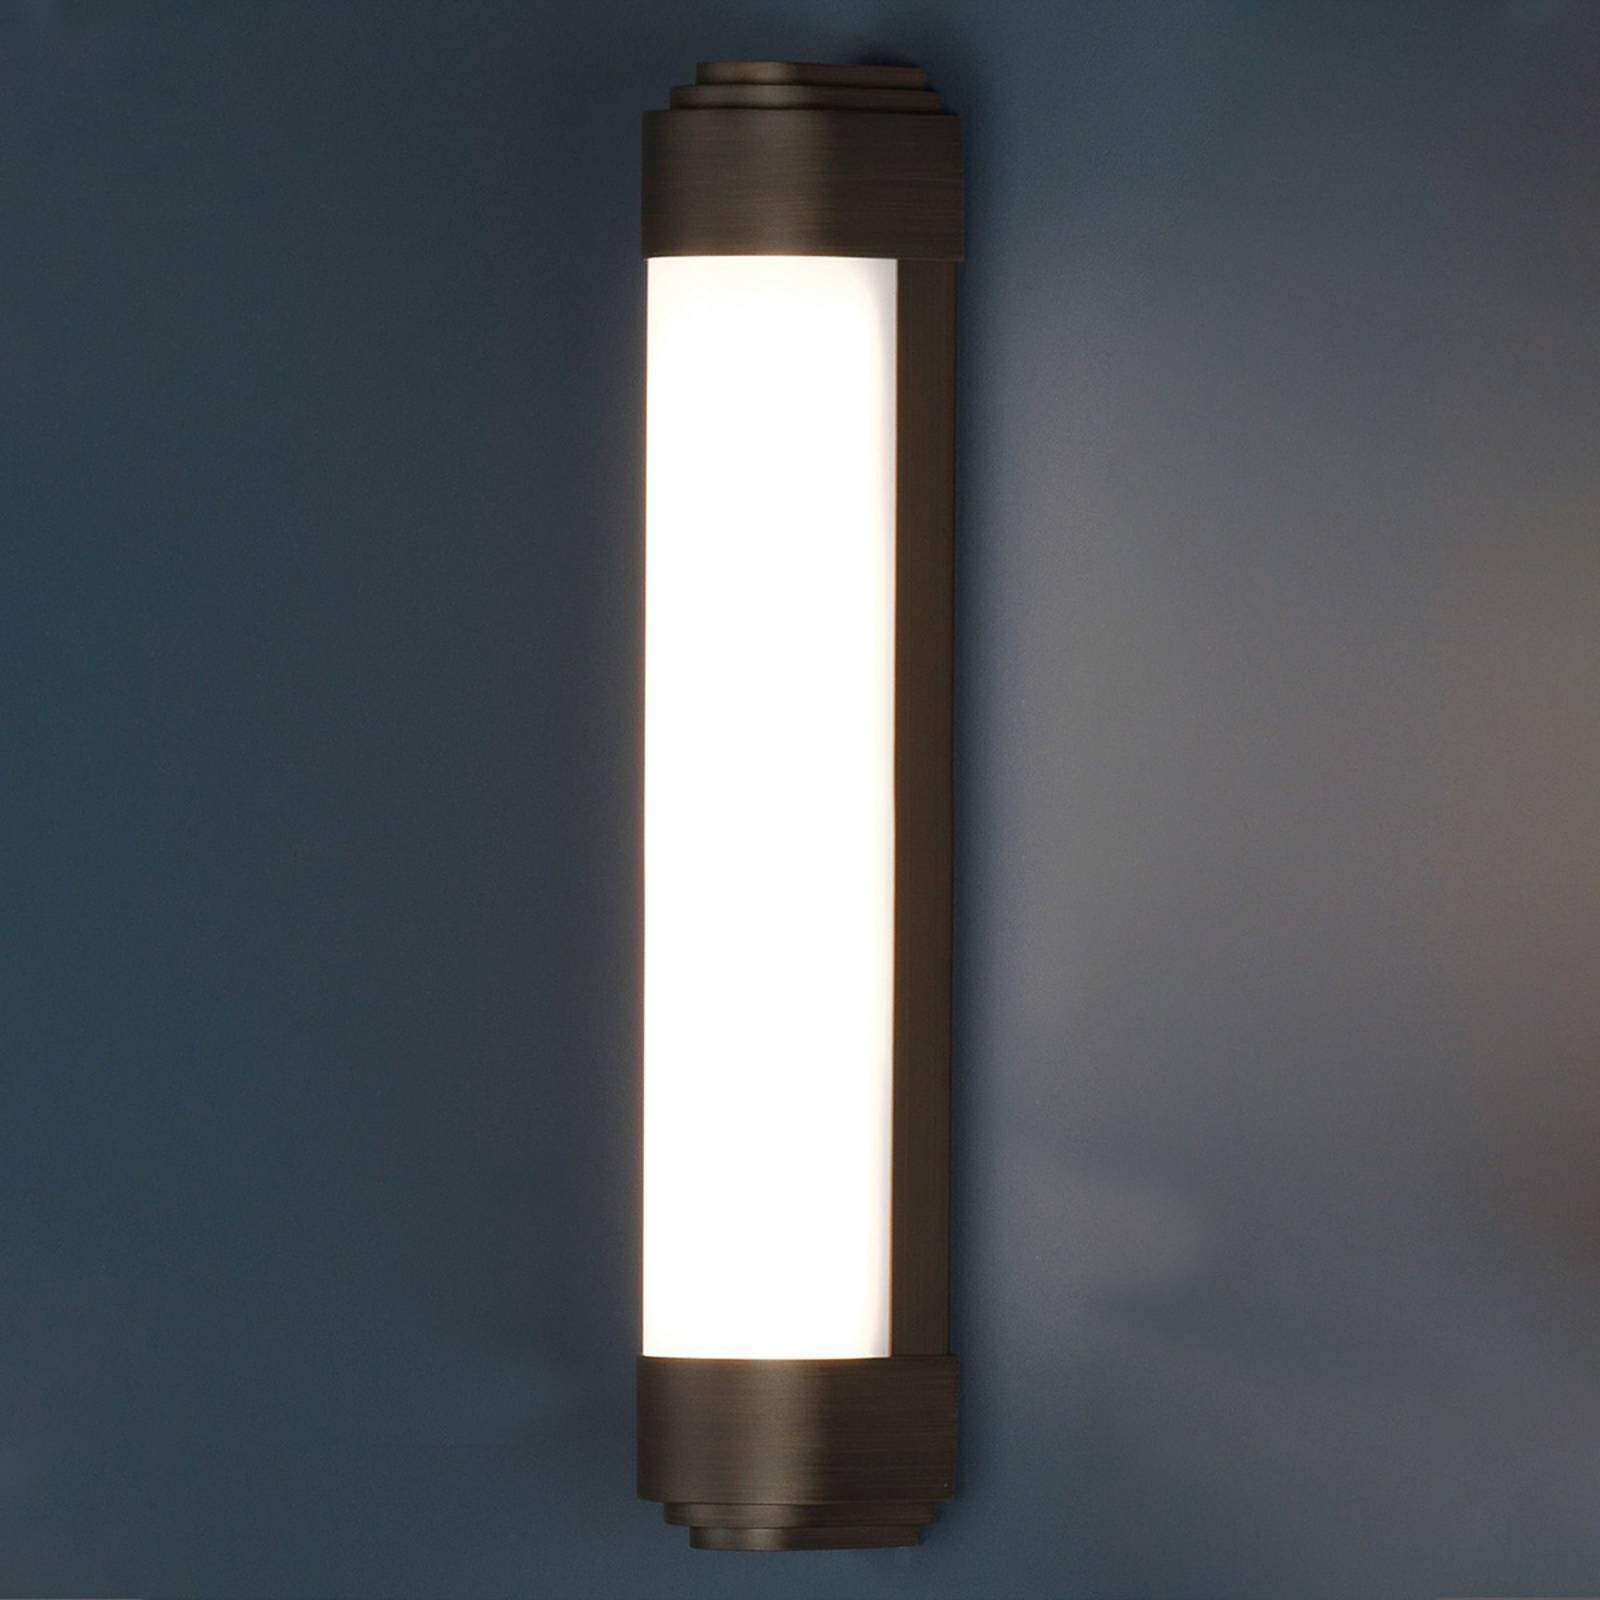 Astro Belgravia LED-Wandleuchte, 60 cm